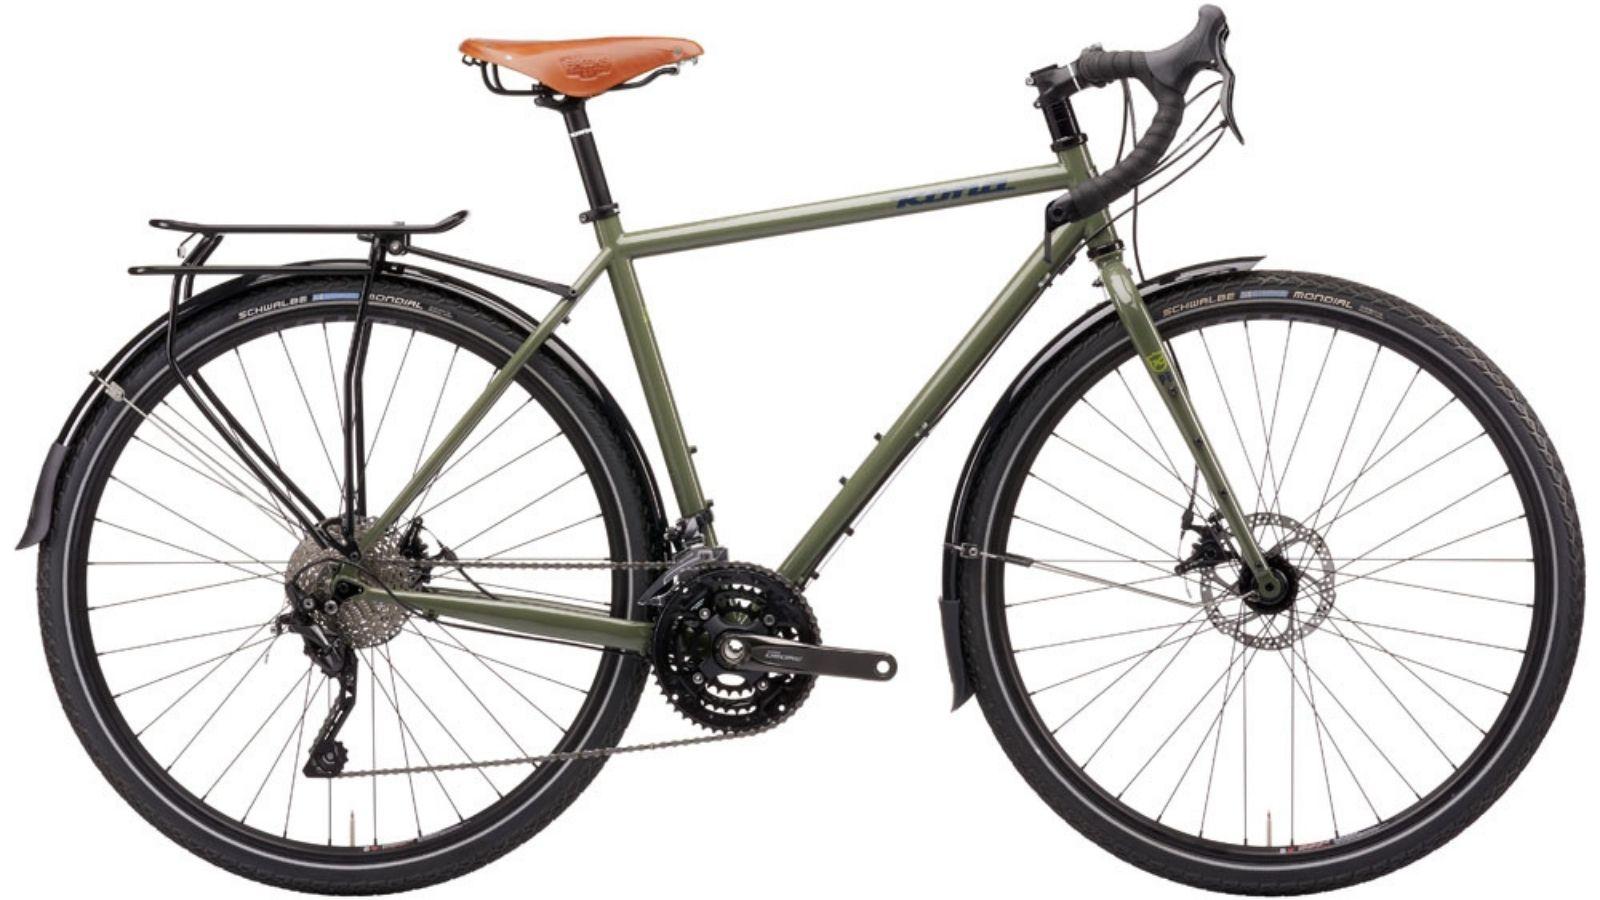 La bici da cicloturismo Kona Sutra